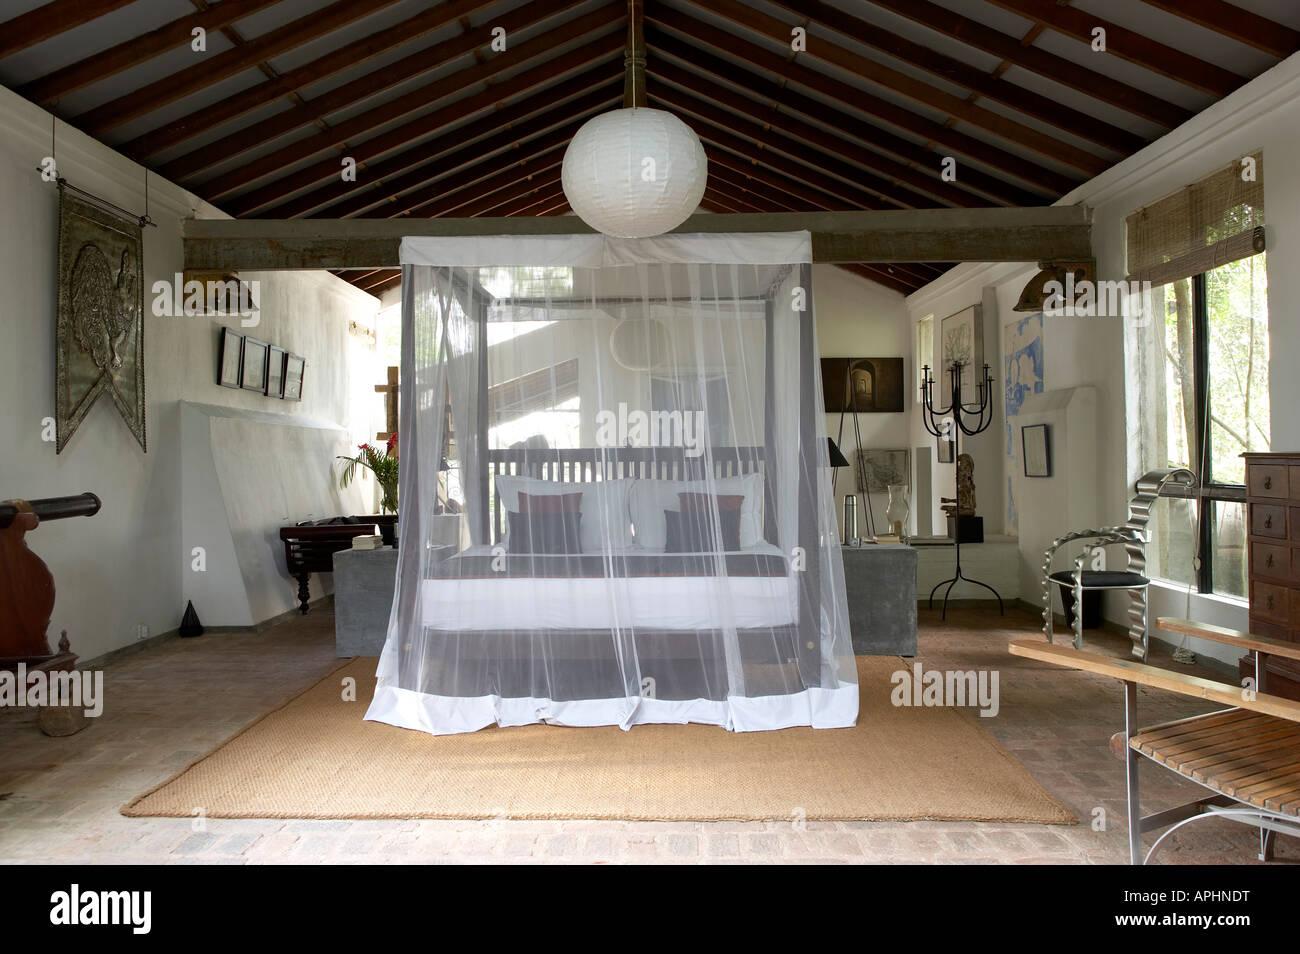 Lunuganga, Sri Lanka.Country home of the late Geoffrey Bawa now a boutique hotel. Architect: Geoffrey Bawa - Stock Image